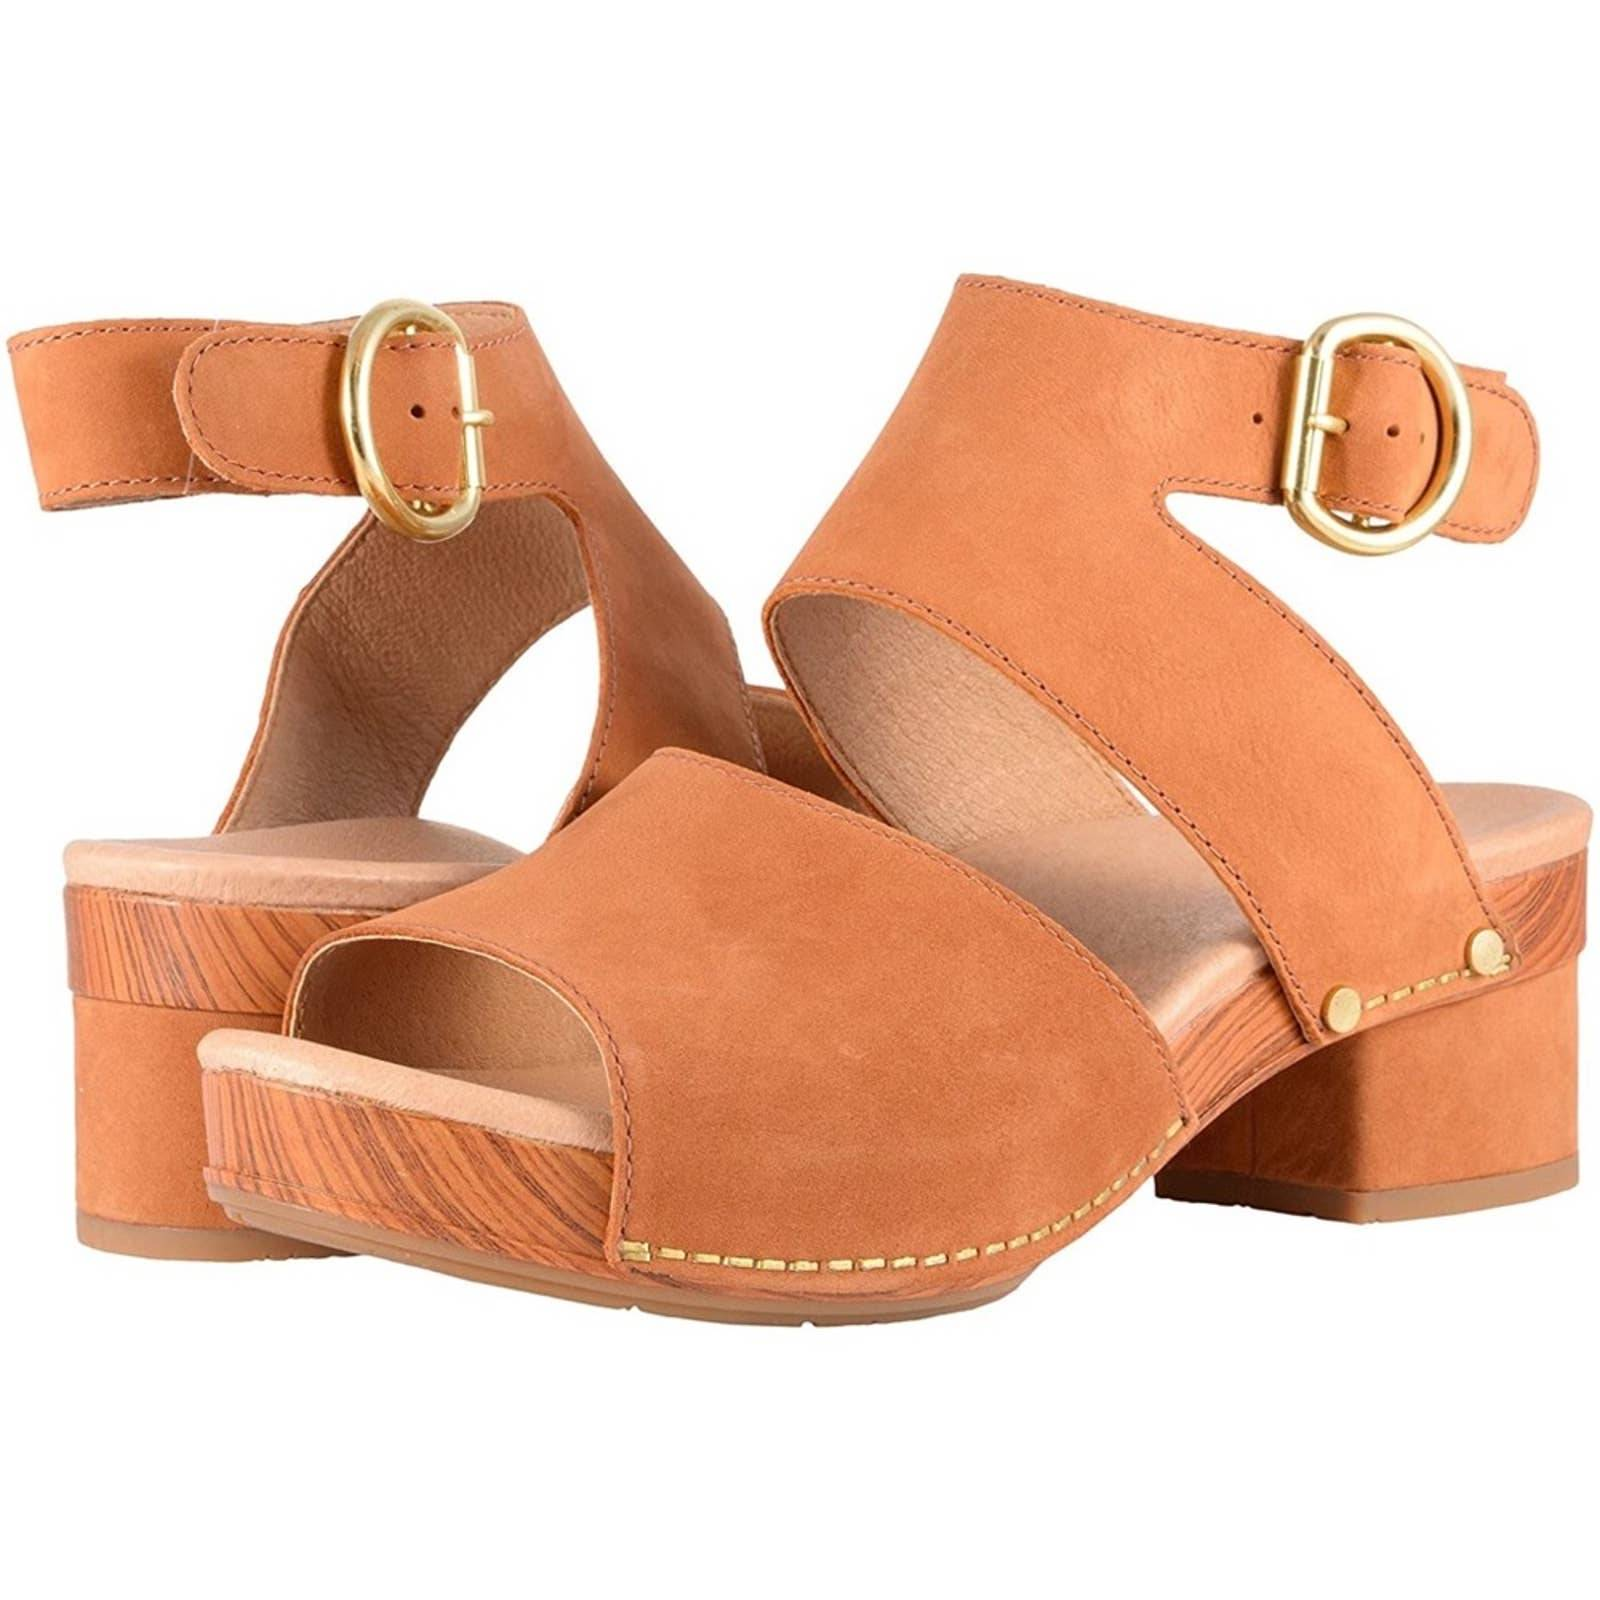 DANSKO Minka Leather Sandals Camel